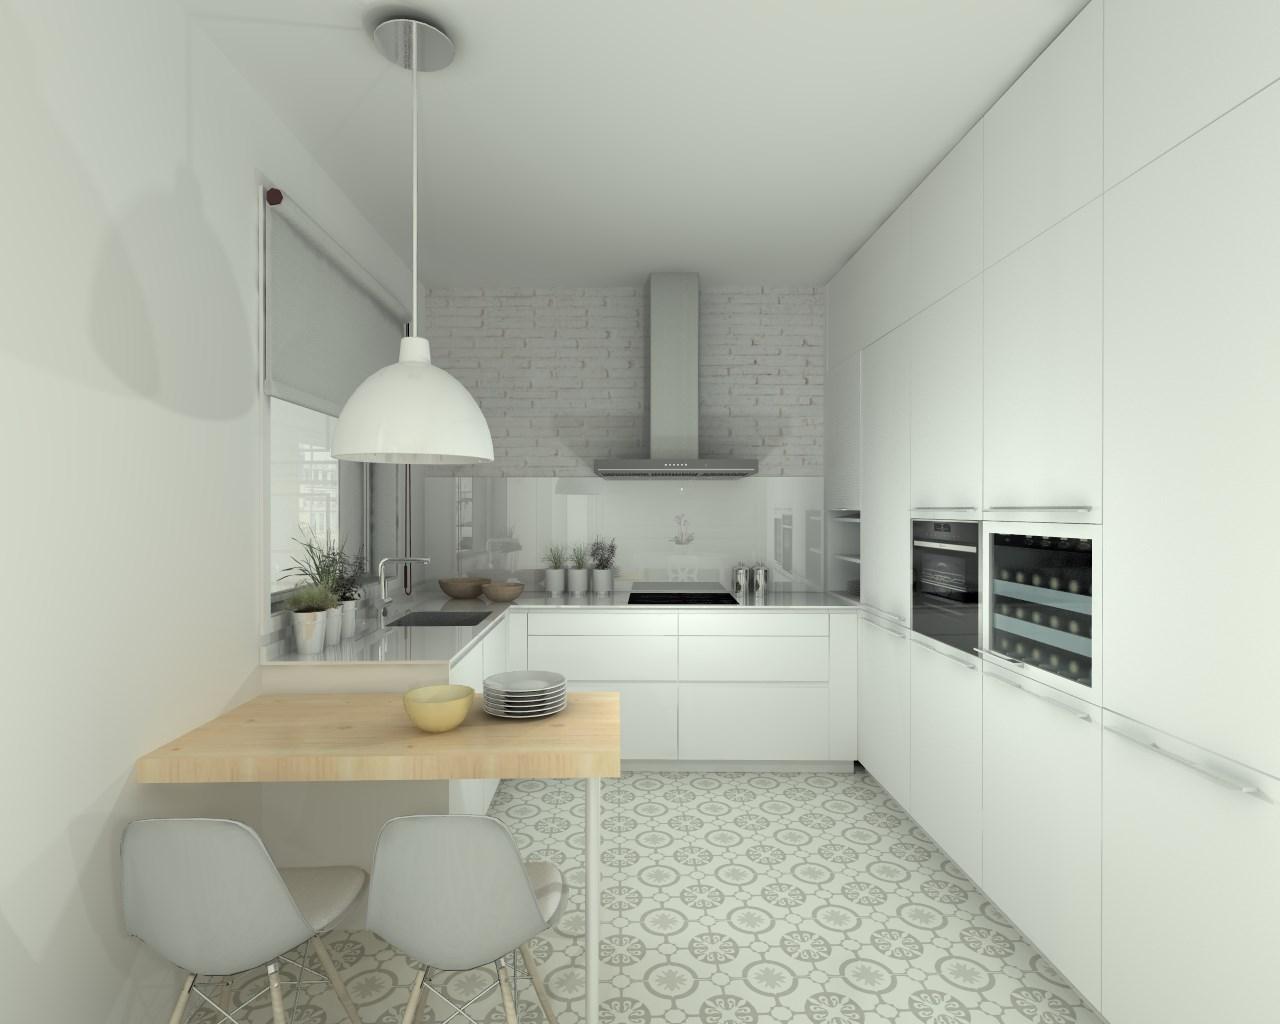 Cocina santos modelo line estratificado blanco encimera for Modelo de cocina 2016